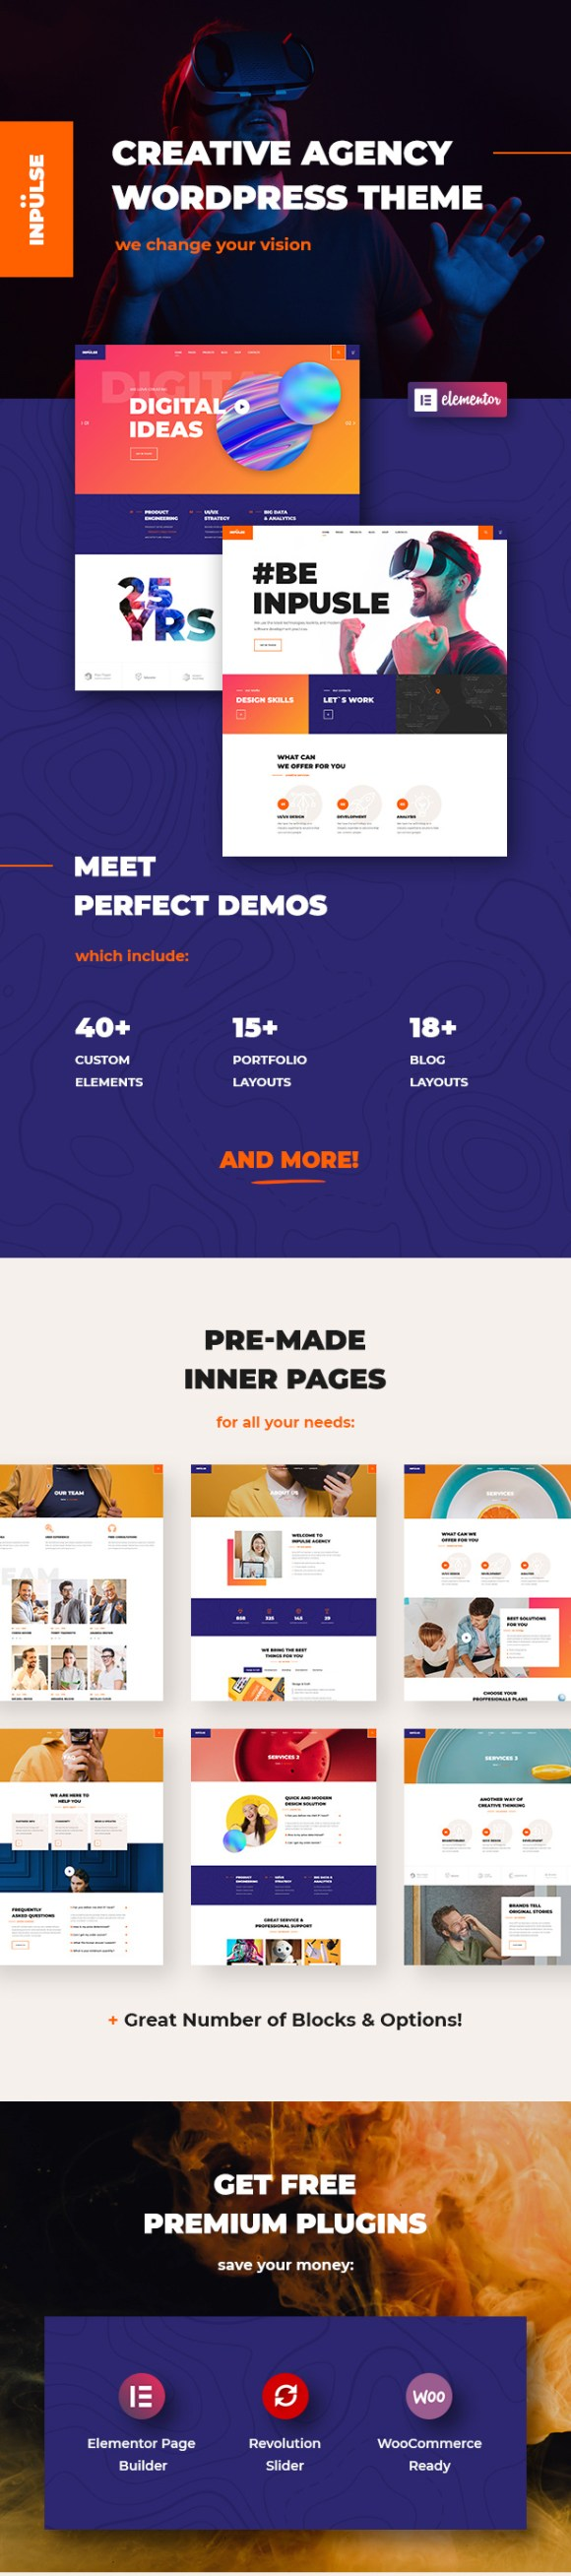 InPulse - Creative Agency WordPress Theme - 1